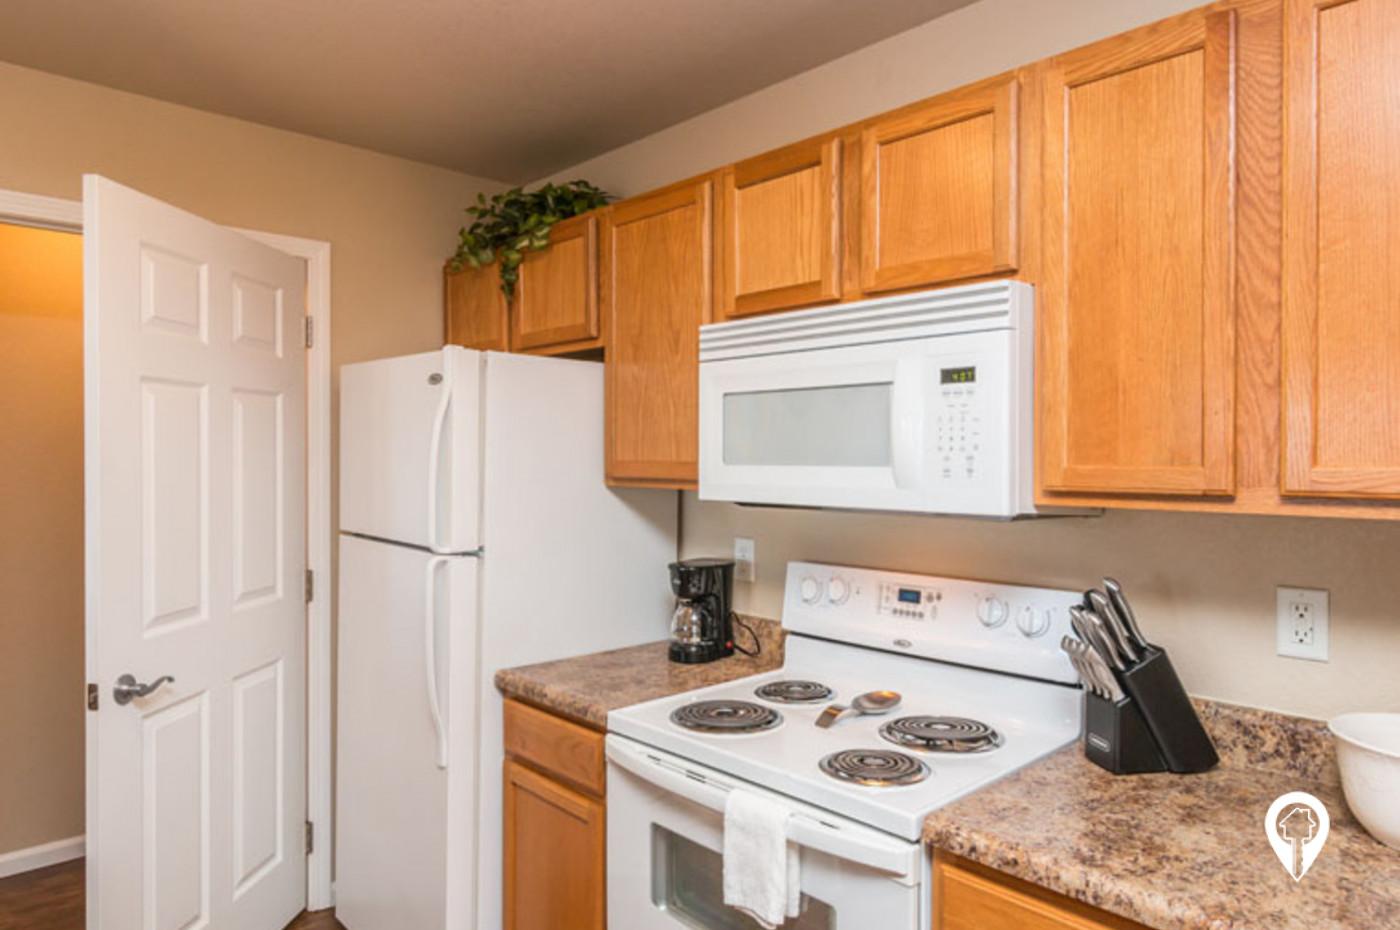 Homestead-Garden-Stylish-Kitchens